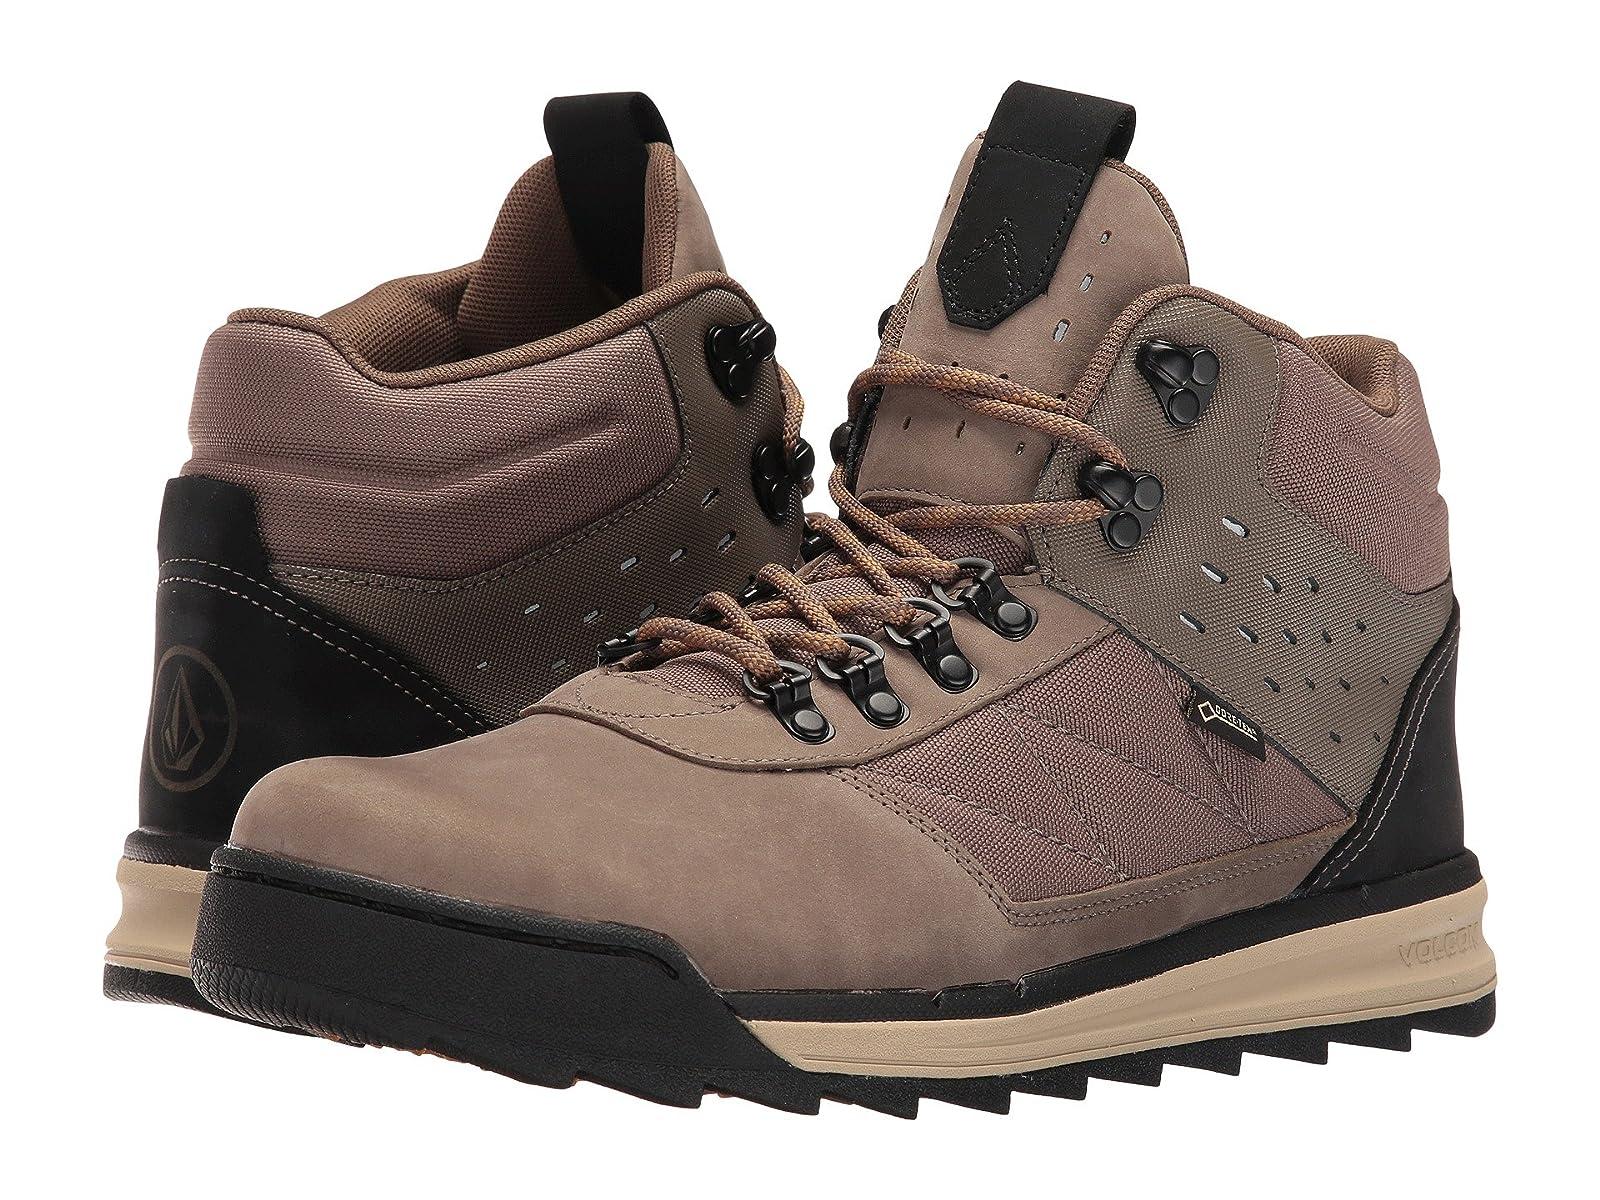 Volcom Shelterlen GTX BootCheap and distinctive eye-catching shoes